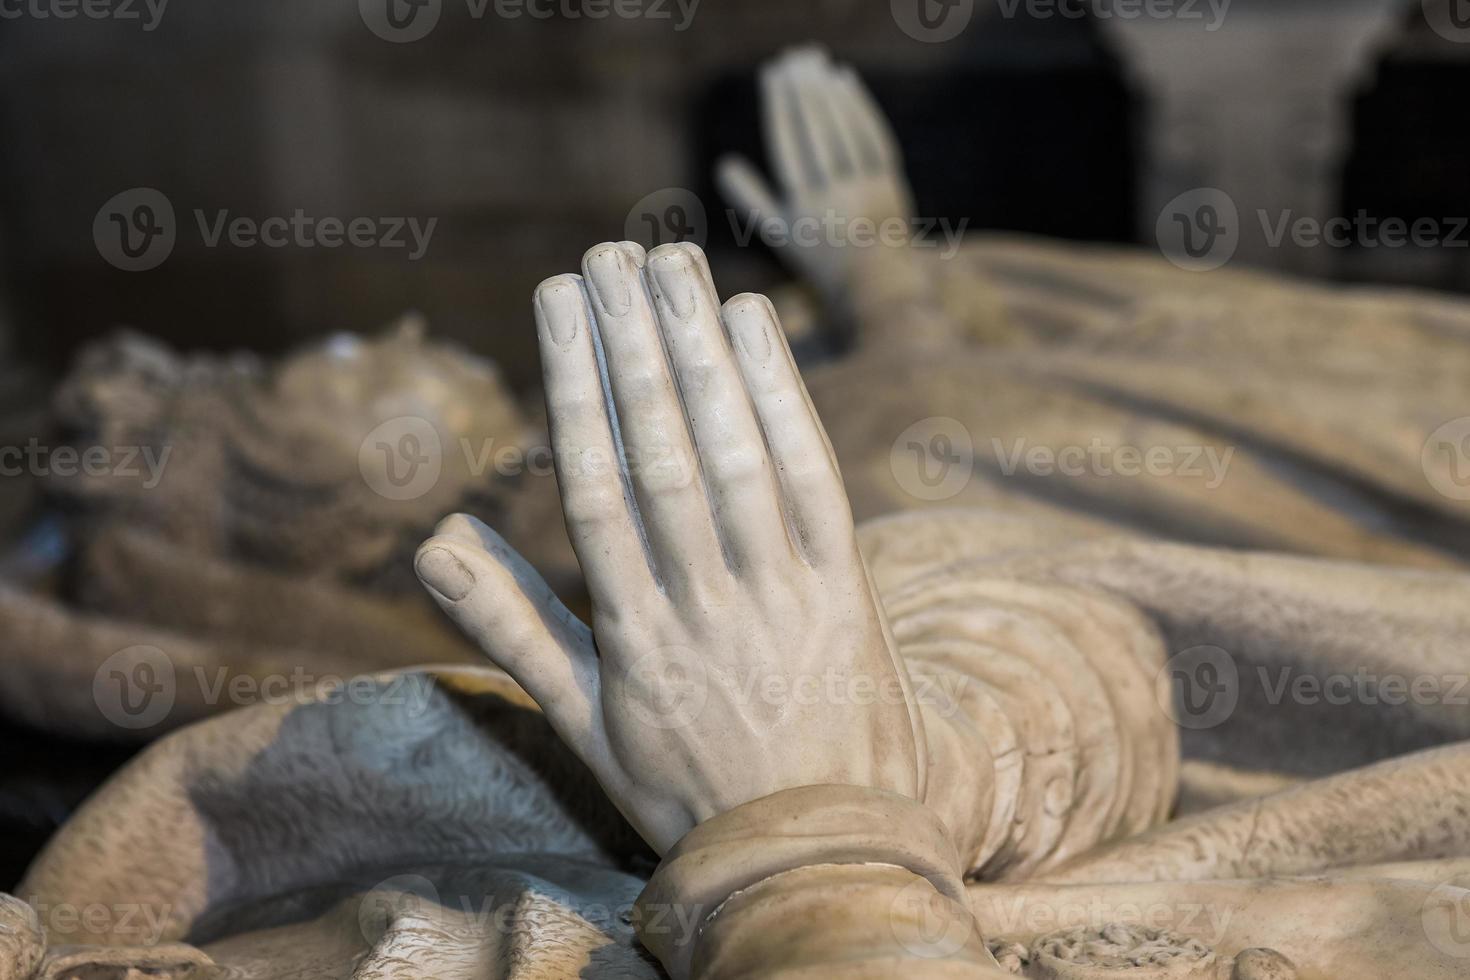 Estatua del rey Enrique II en la basílica de Saint-Denis, Francia foto